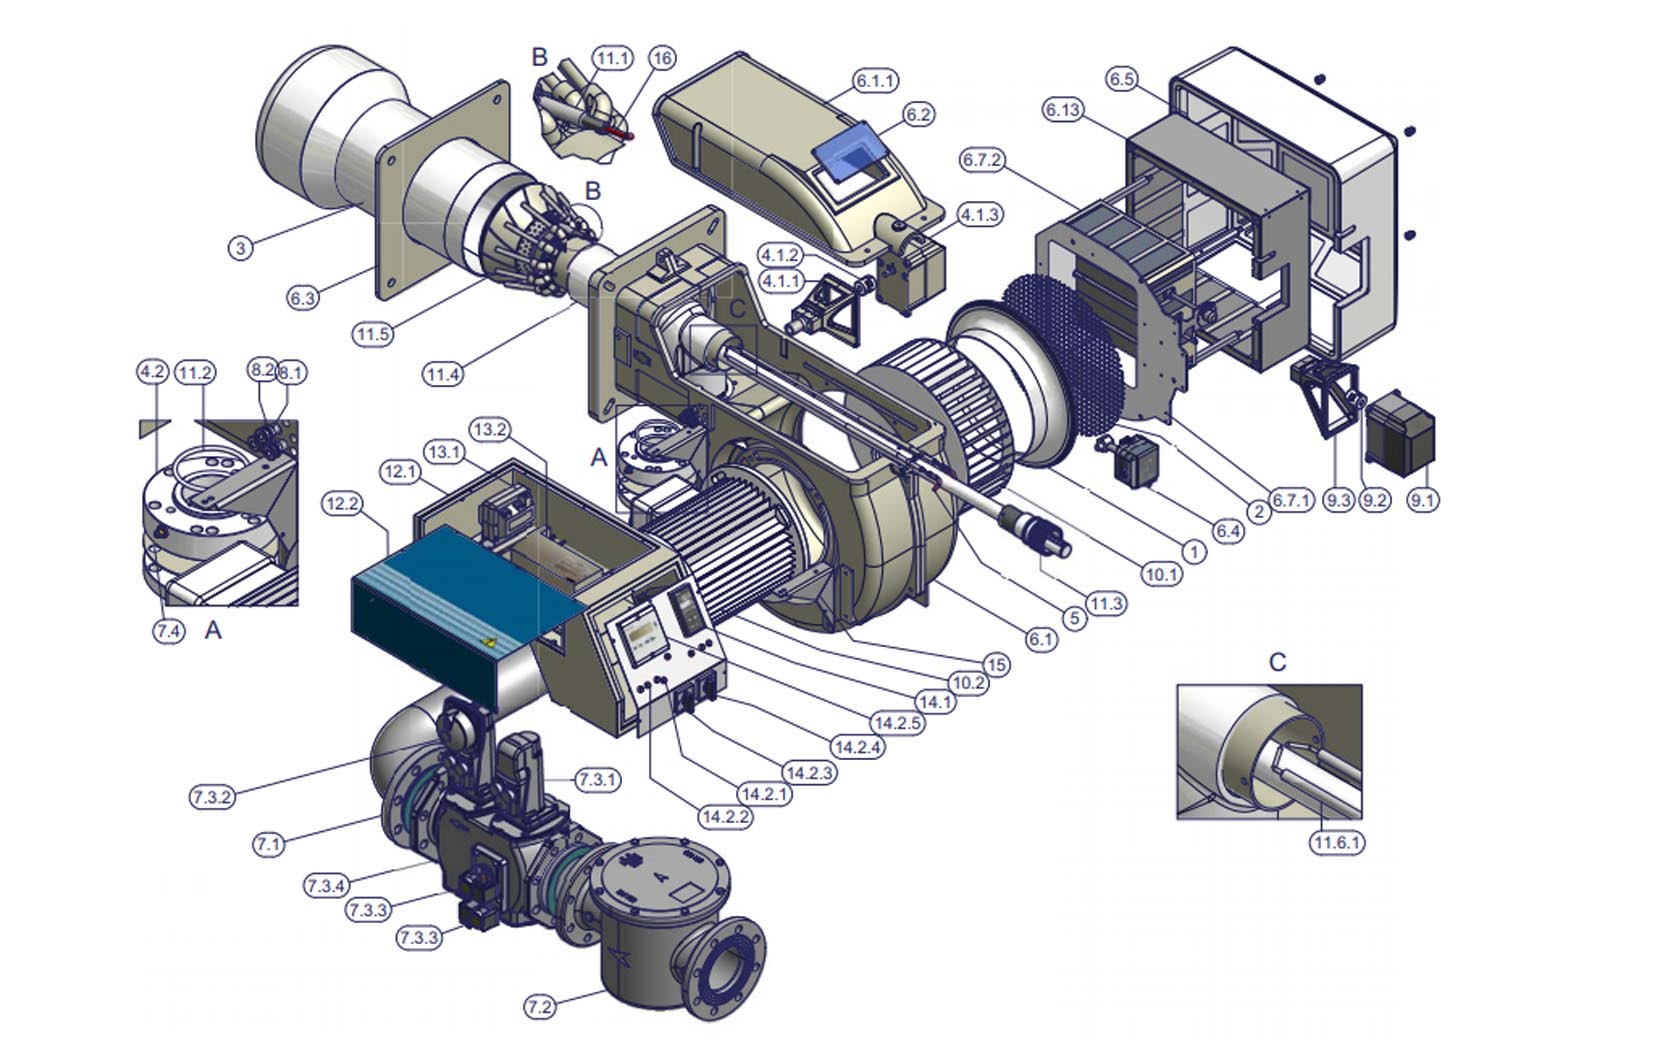 CIB Unigas P520A